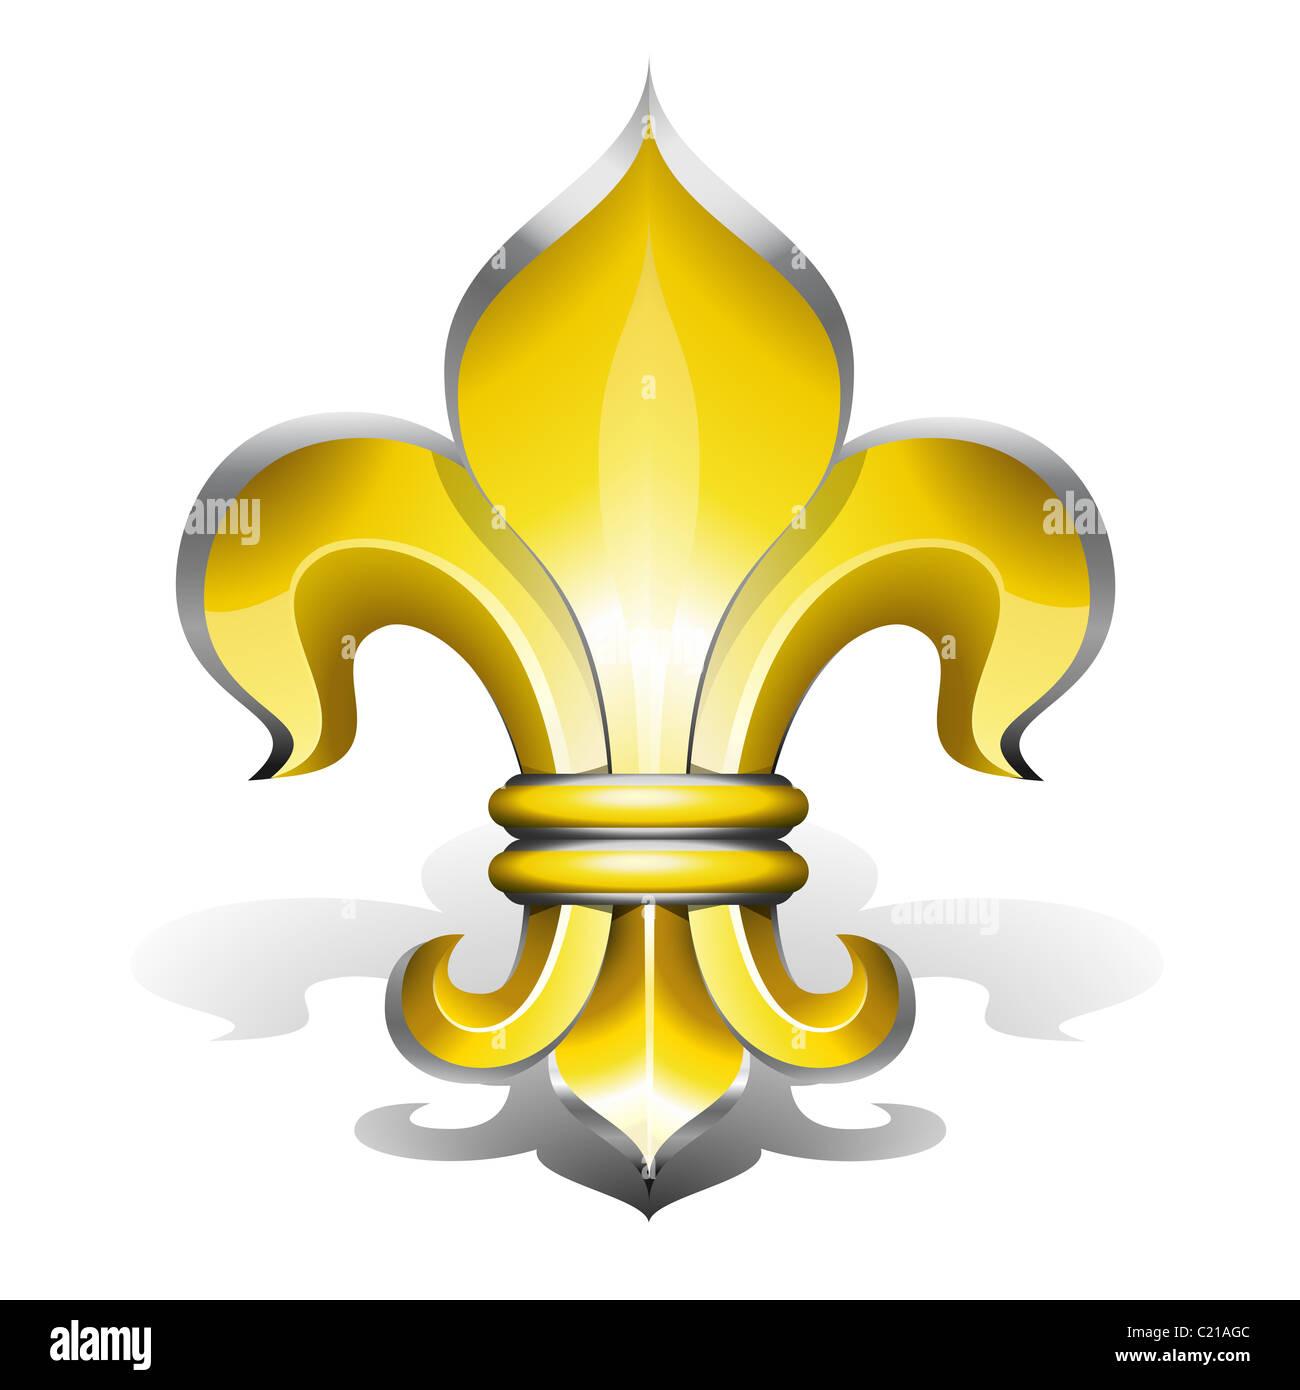 Fleur de lys antique symbol of french royalty stock photo fleur de lys antique symbol of french royalty biocorpaavc